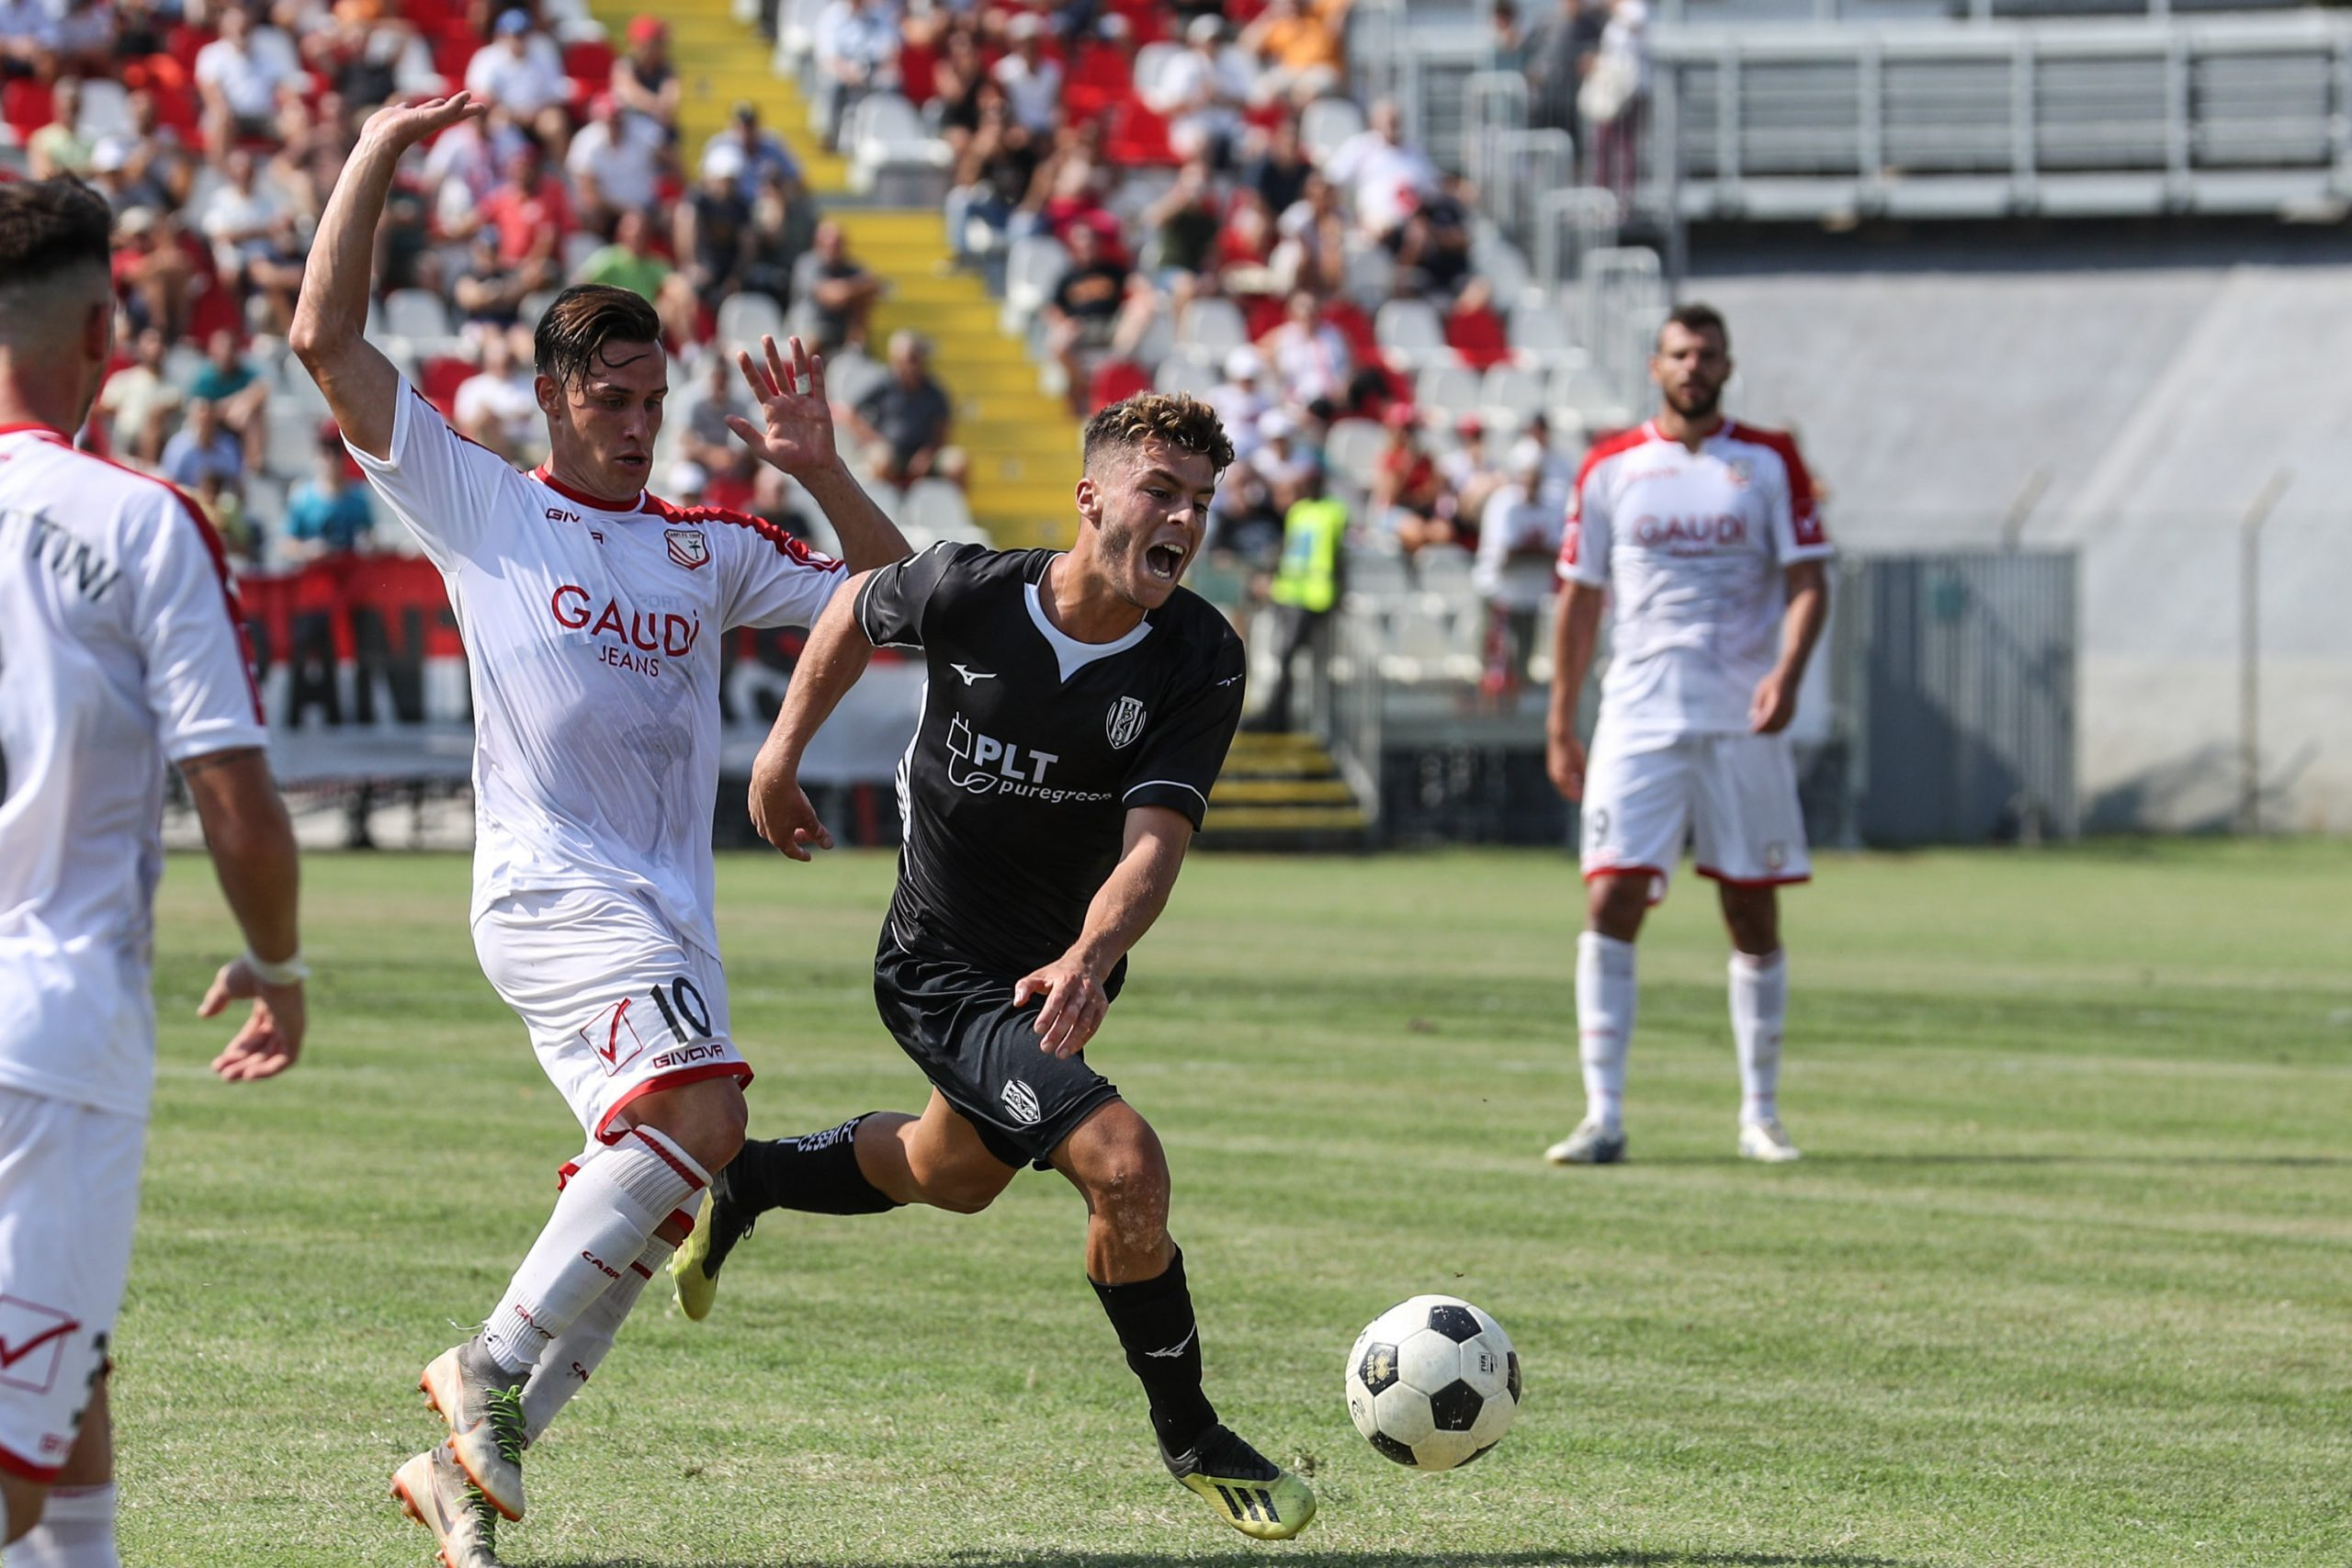 Calcio C, un brutto Cesena cade a Pesaro (1-0)